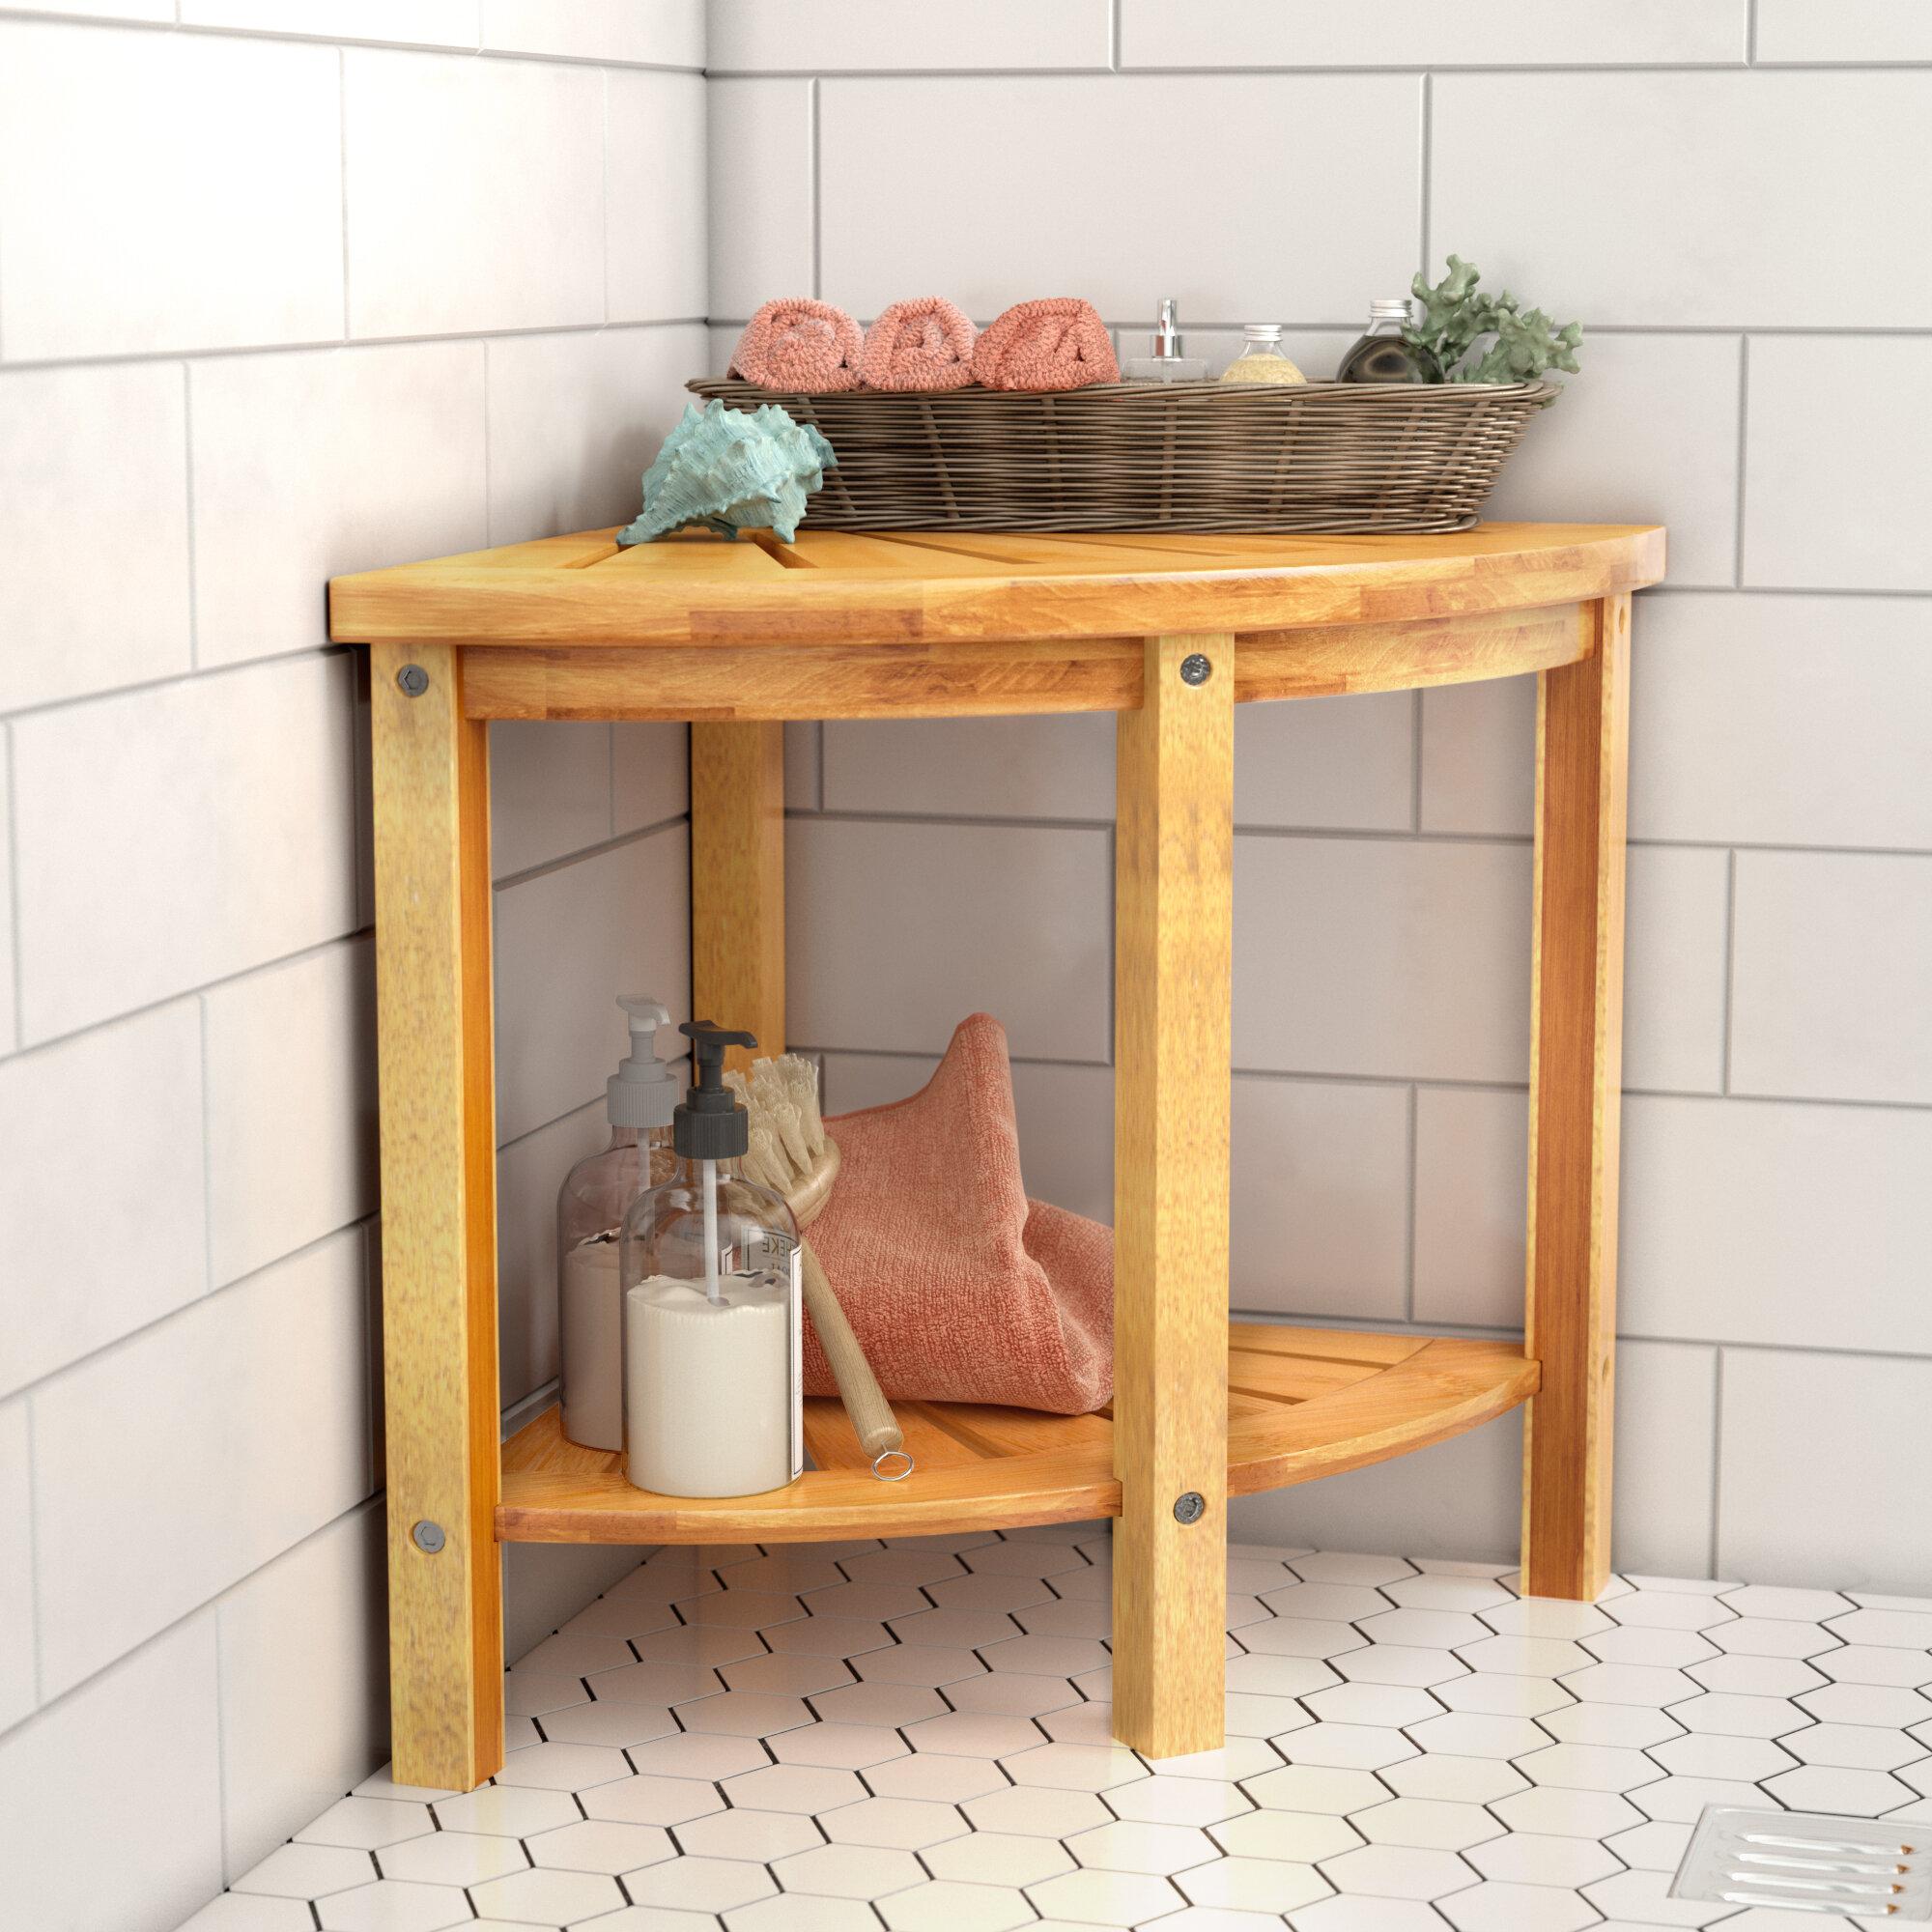 Highland Dunes Barksdale Corner Shower Seat With Storage Shelf Reviews Wayfair